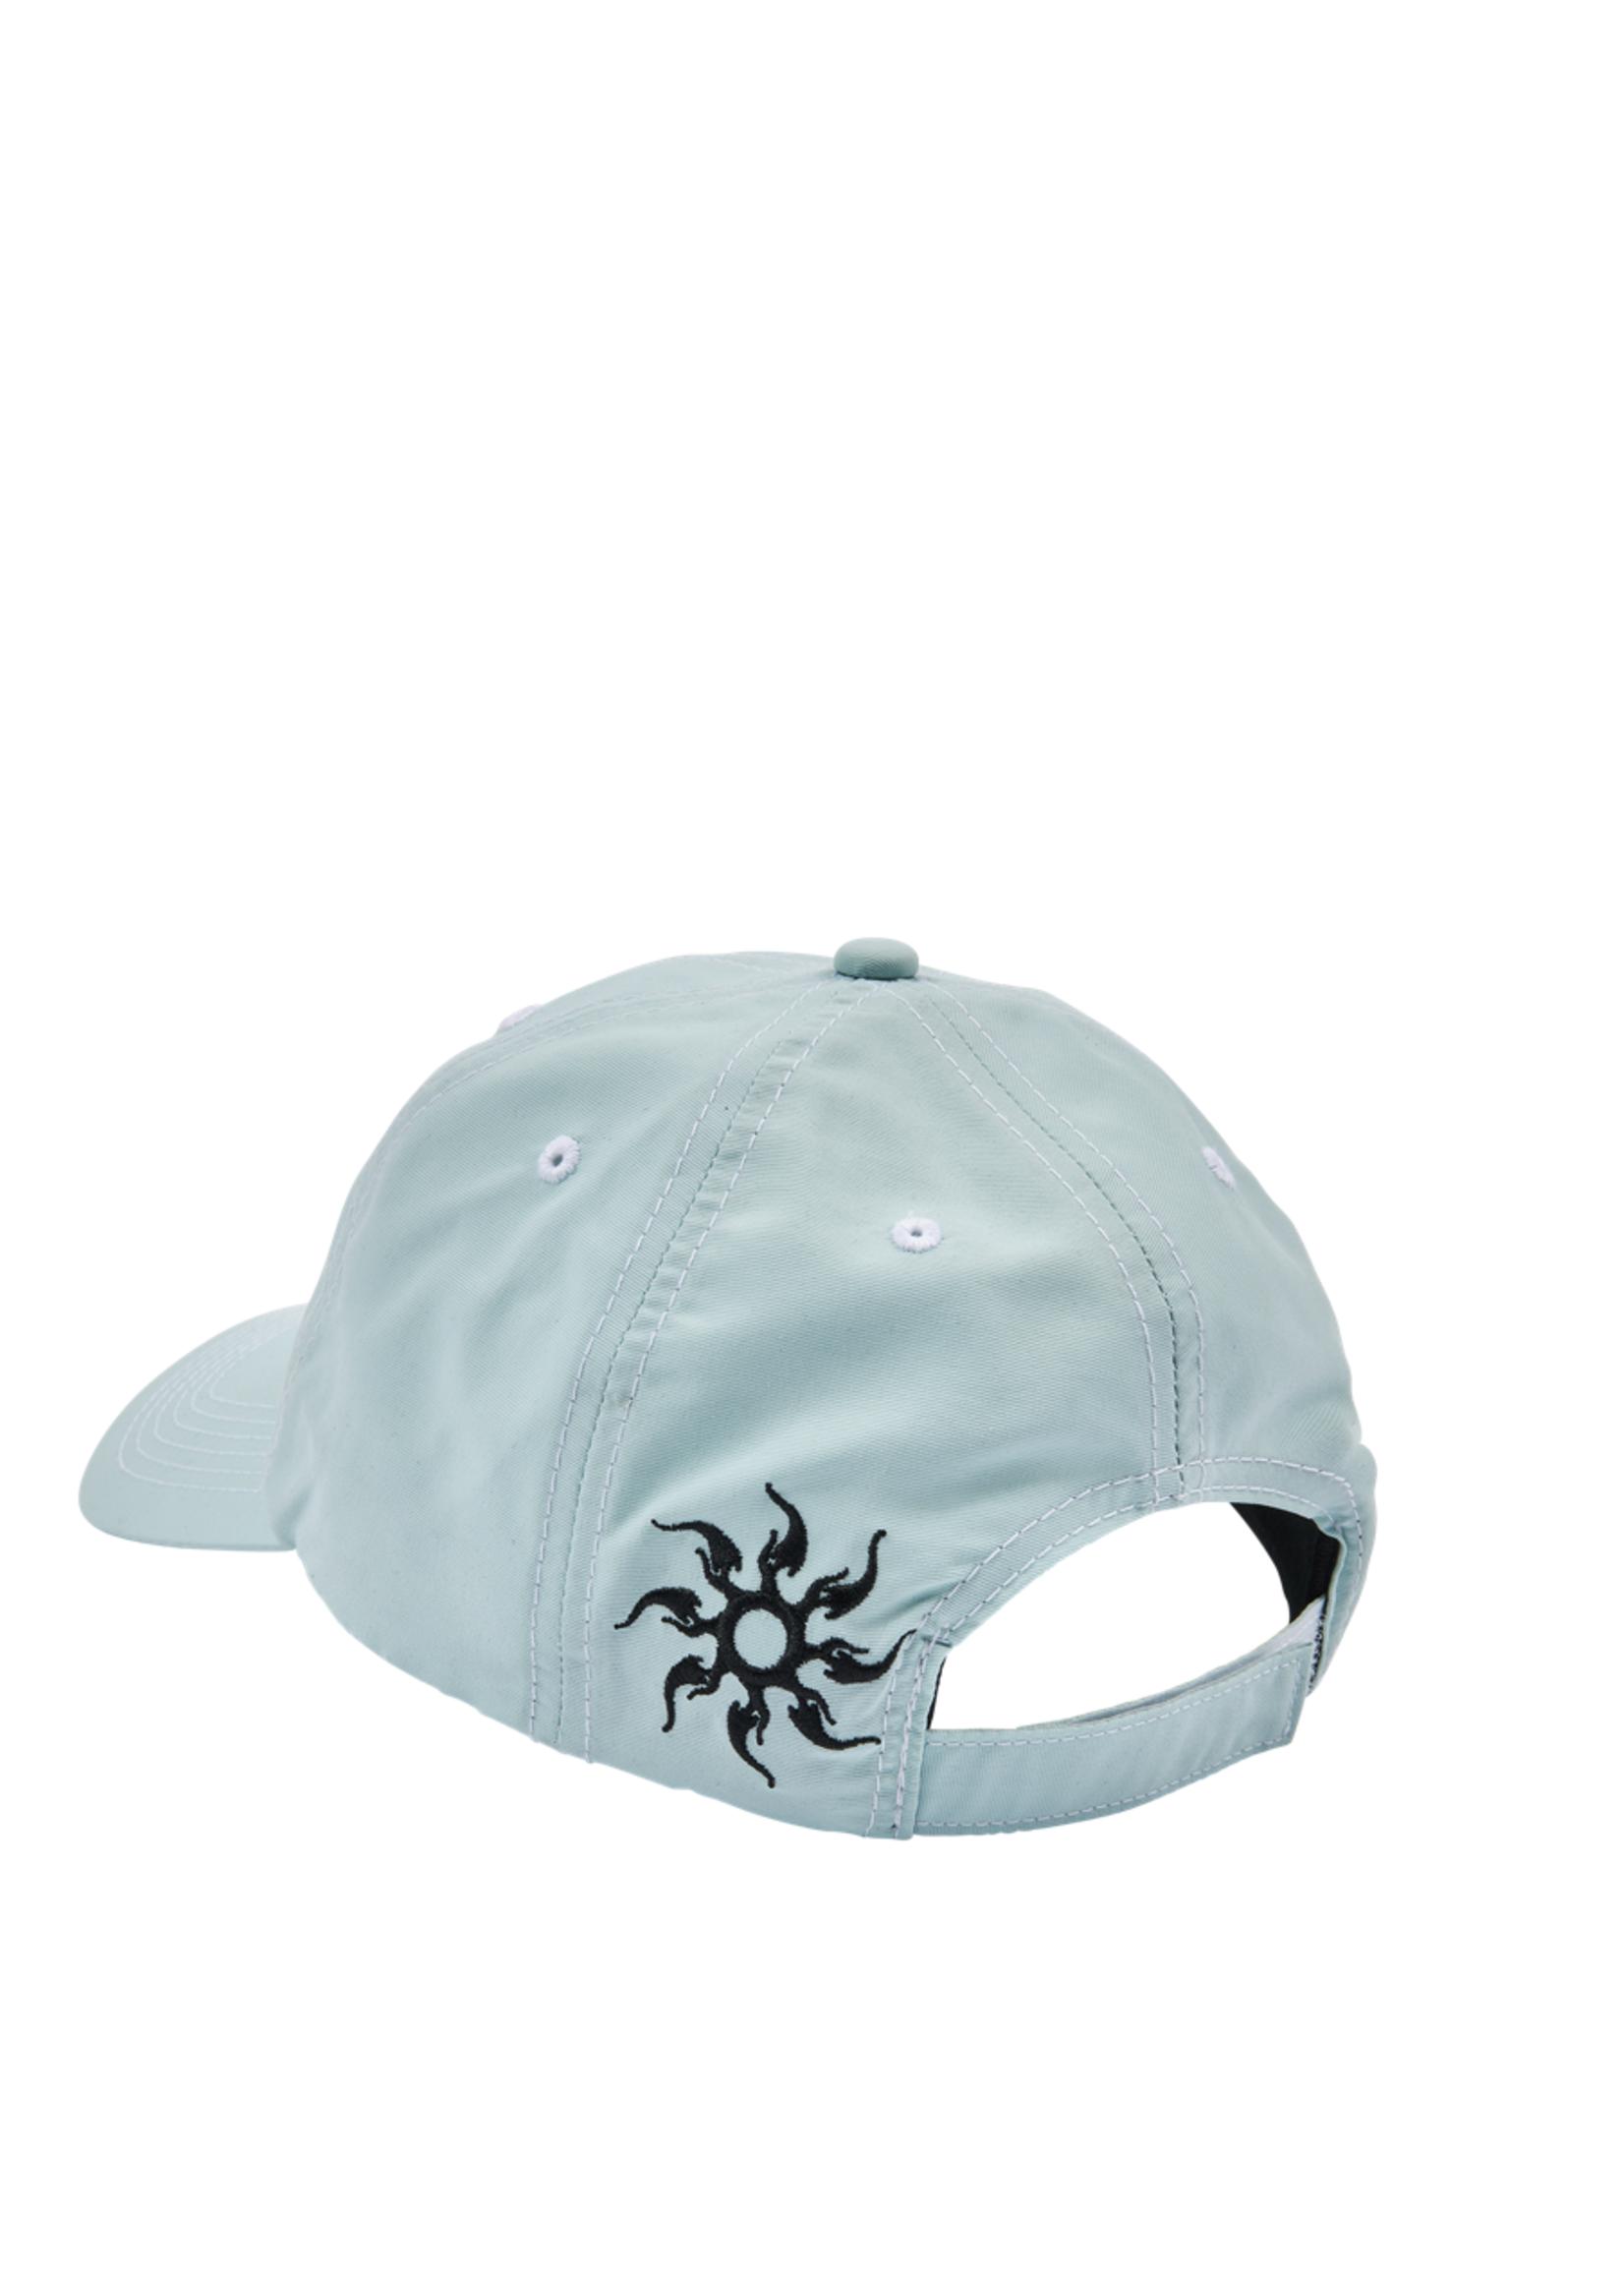 PLEASURES Destiny Nylon Polo Cap in Light Blue